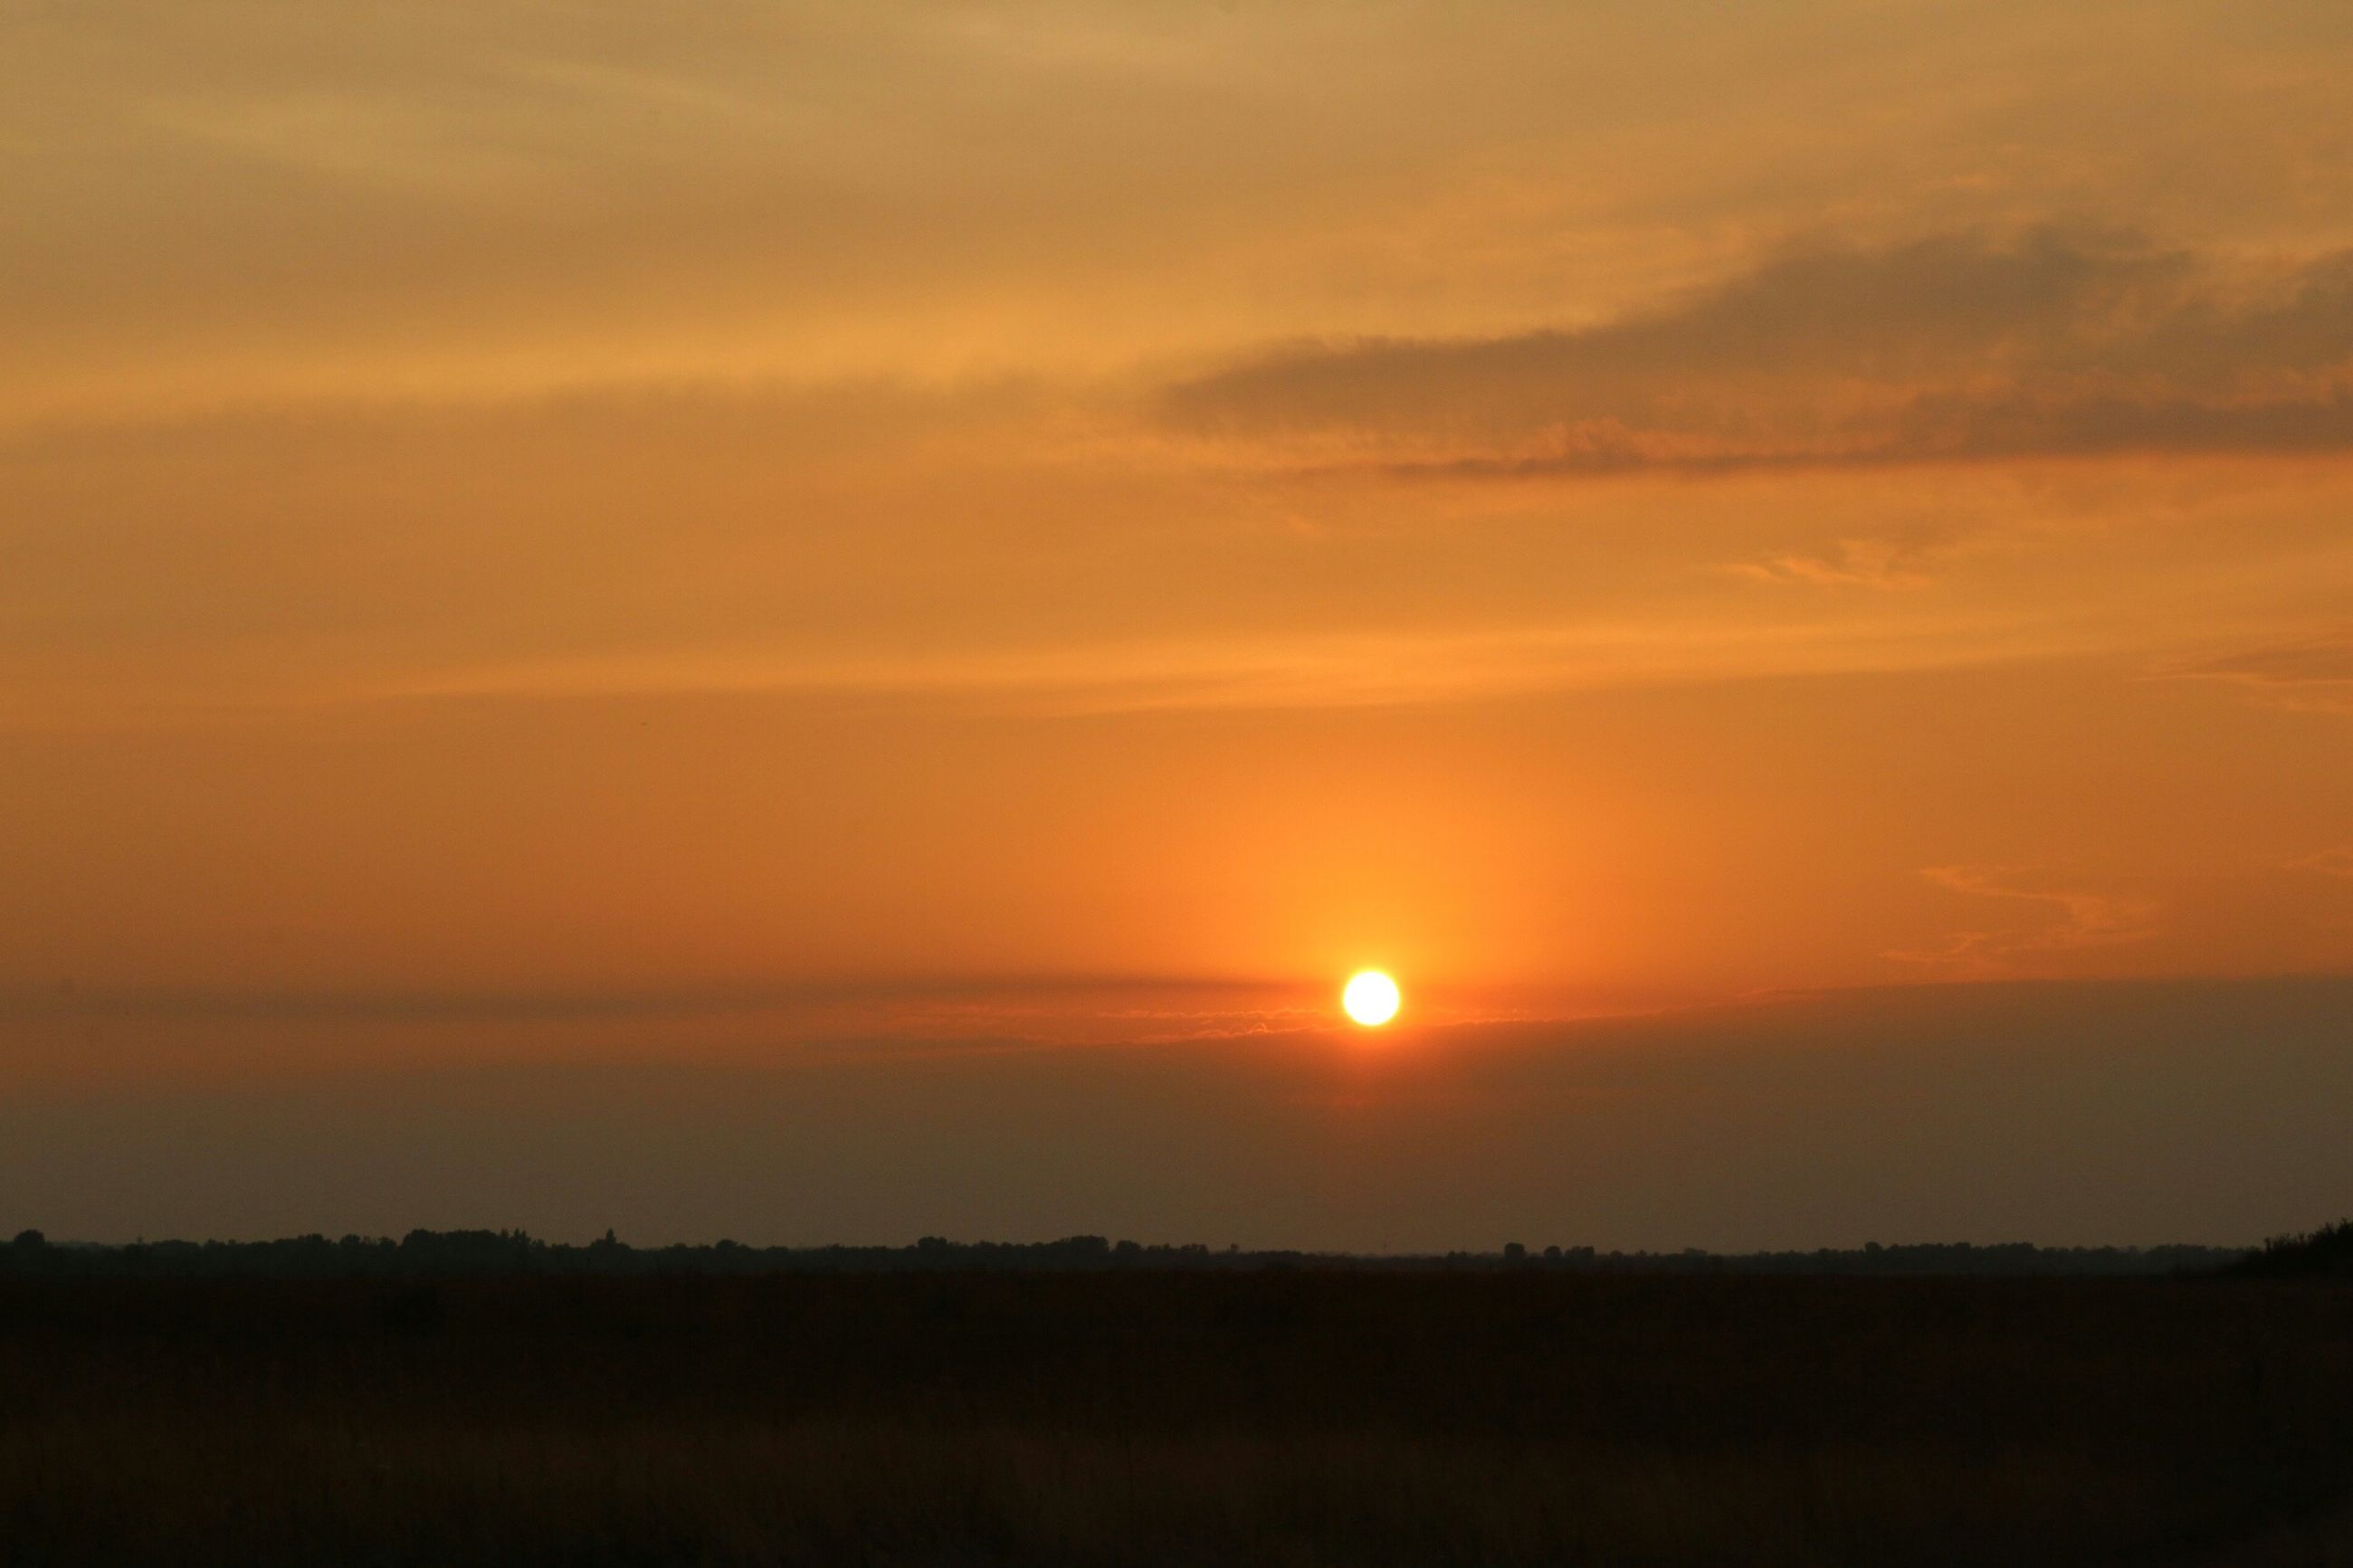 sunset, sun, orange color, scenics, tranquil scene, beauty in nature, tranquility, silhouette, sky, idyllic, nature, landscape, sunlight, cloud - sky, dramatic sky, majestic, outdoors, cloud, moody sky, no people